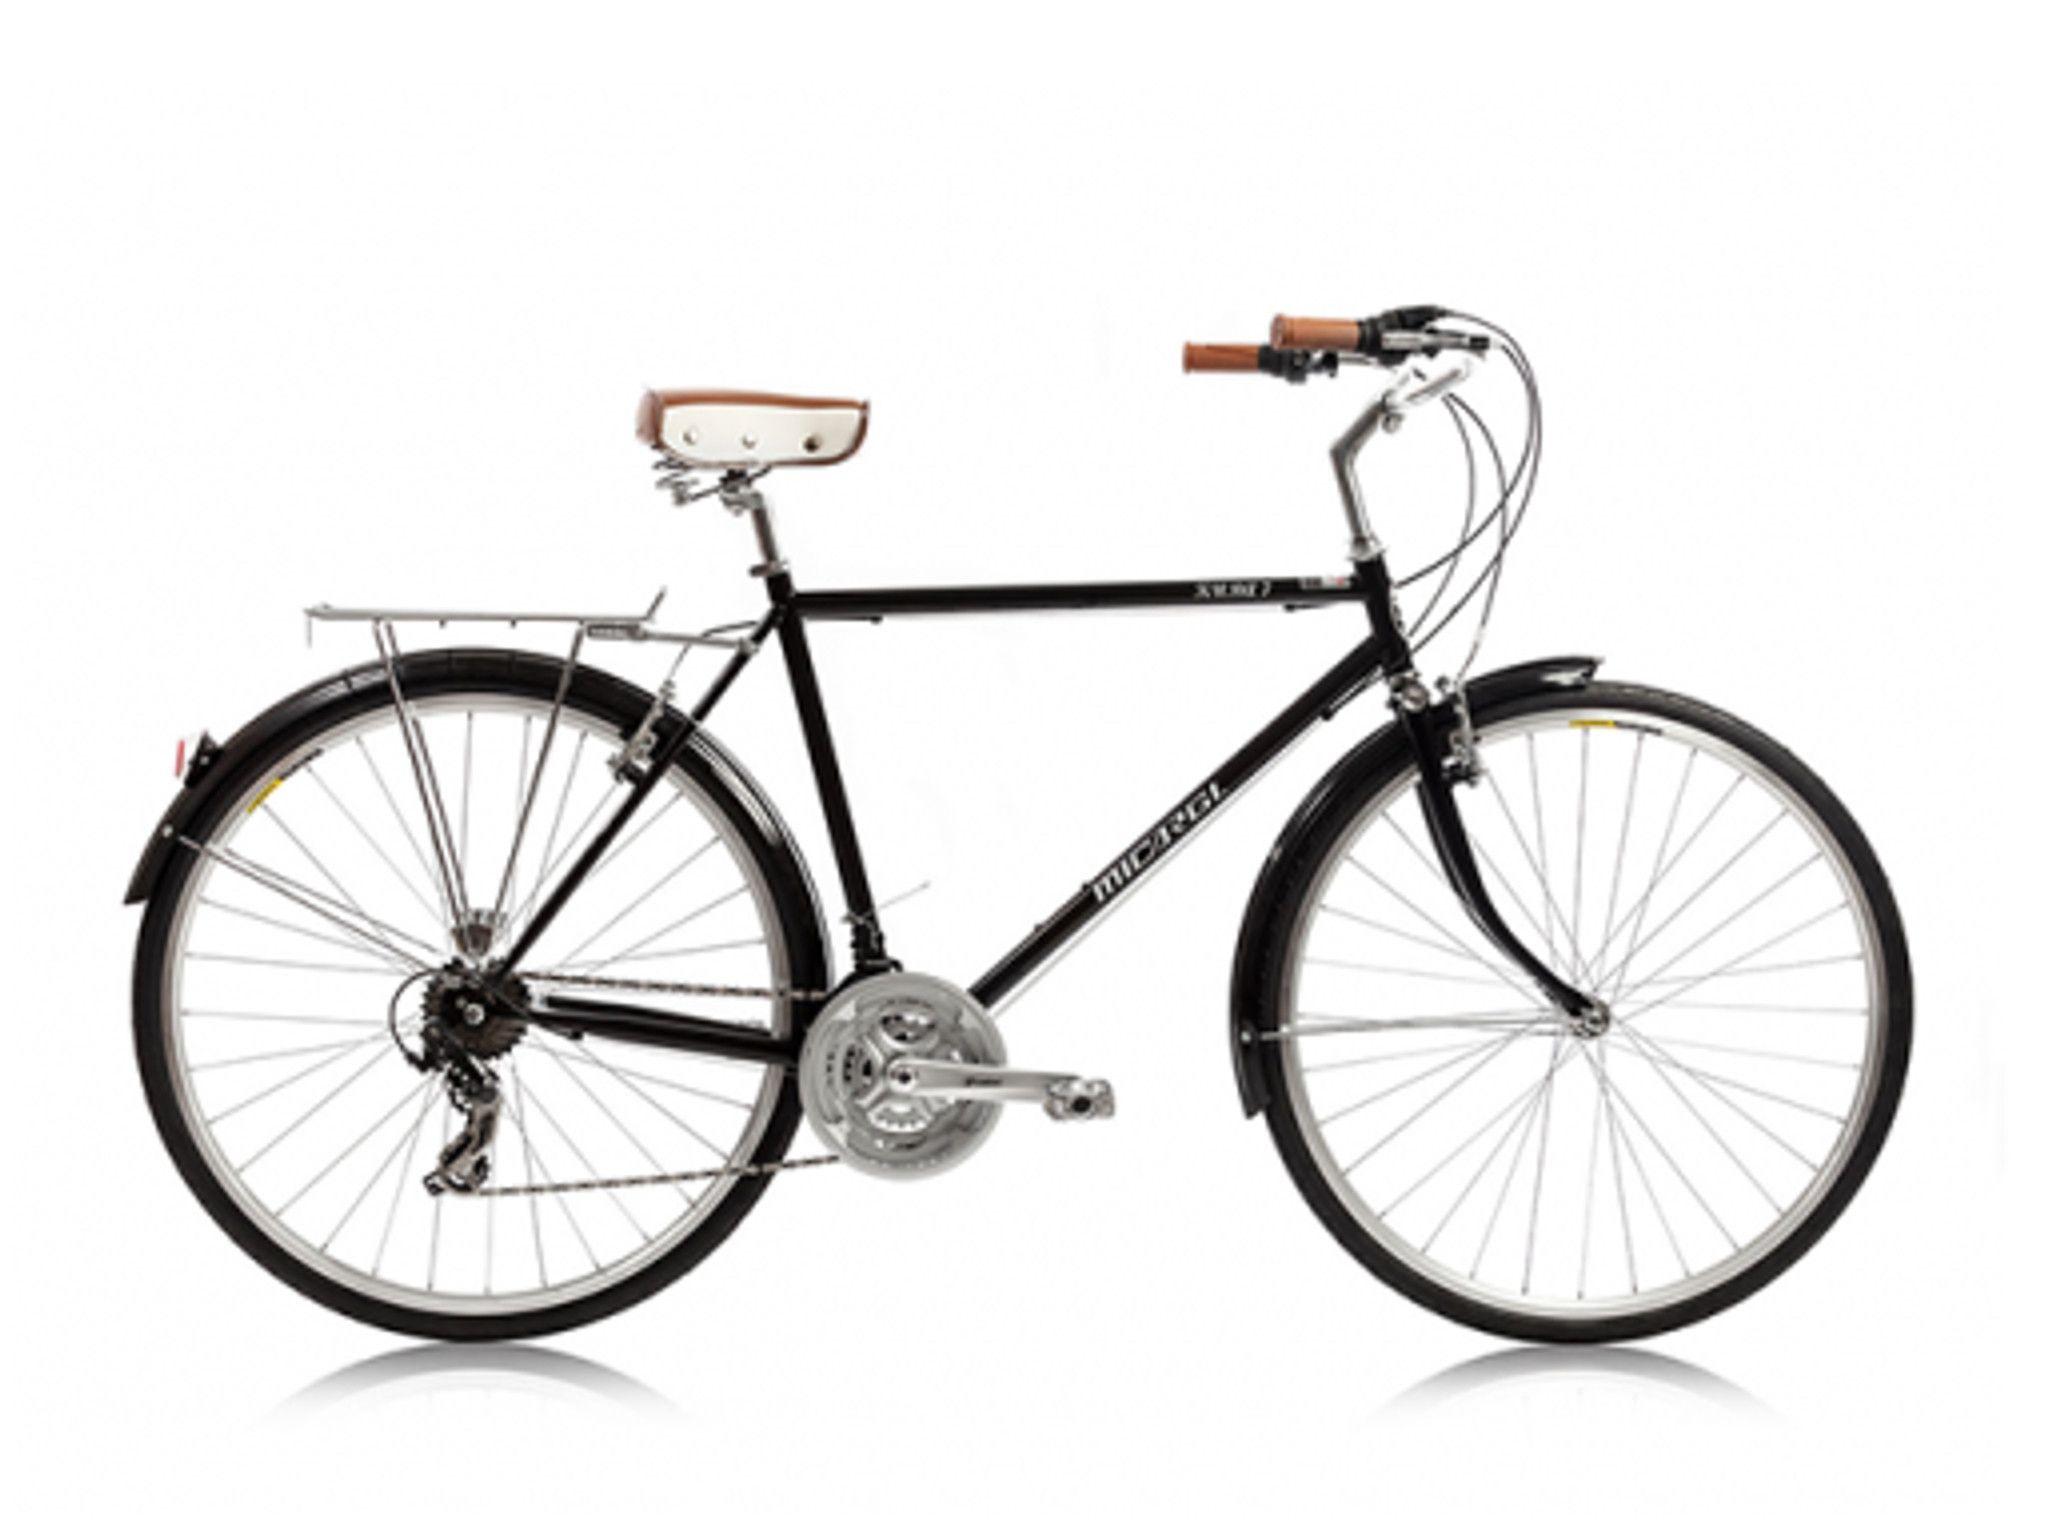 Micargi kuba 7 shimano 7 speed city commuter bike black vintage euro